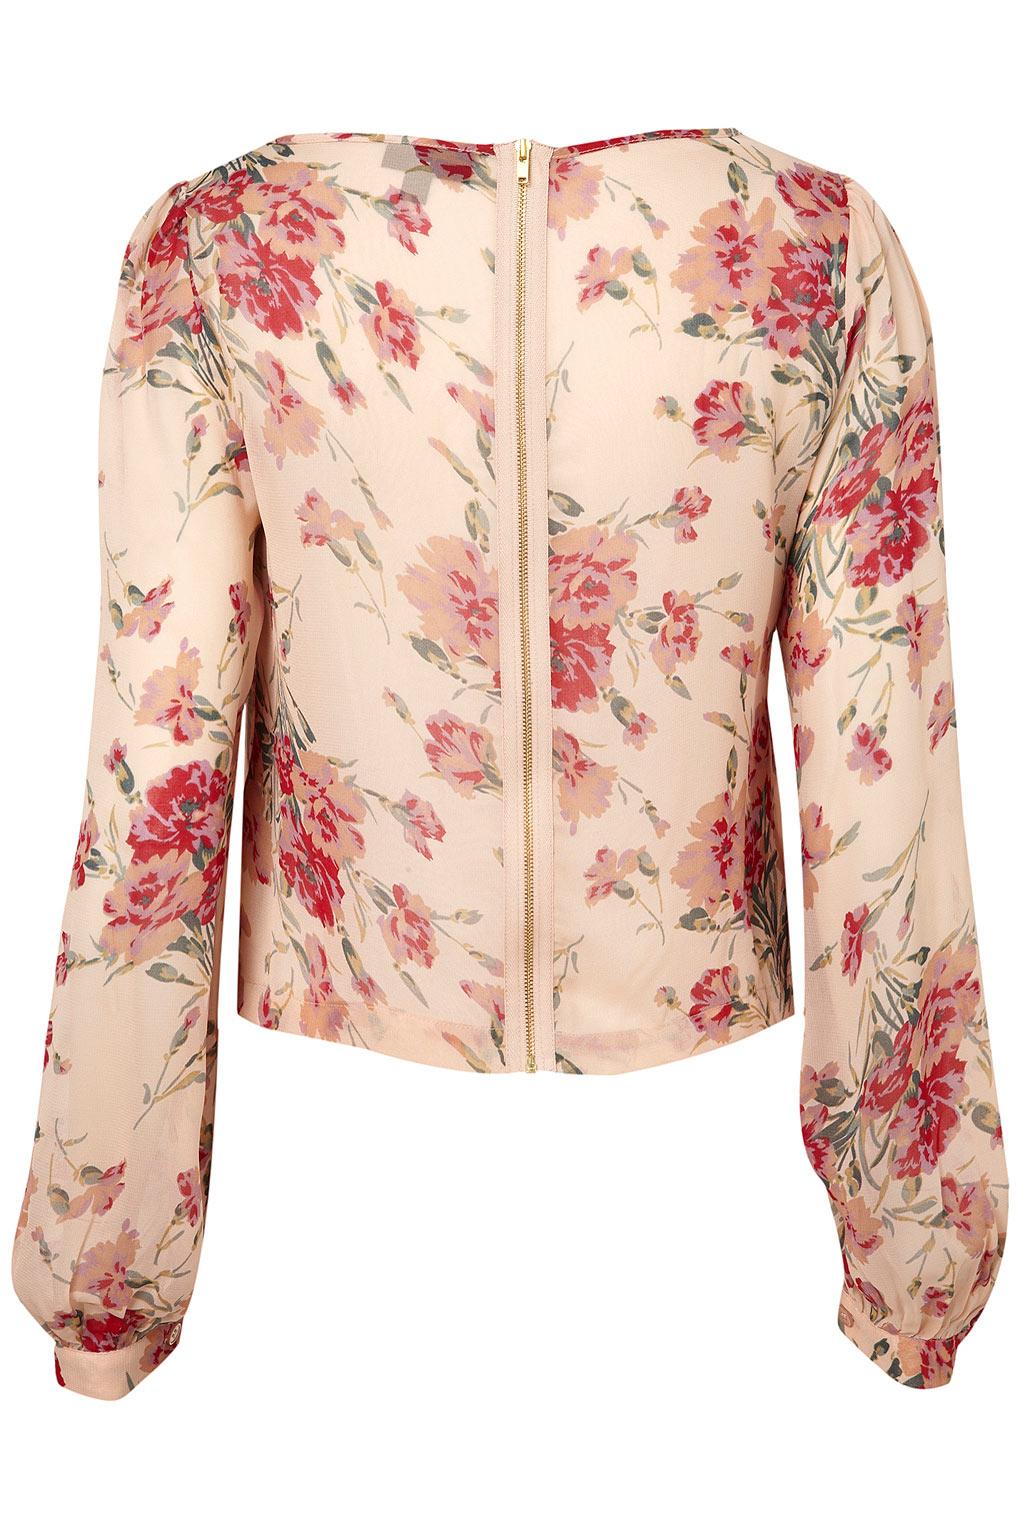 Topshop Long Sleeve Rose Print Blouse 110